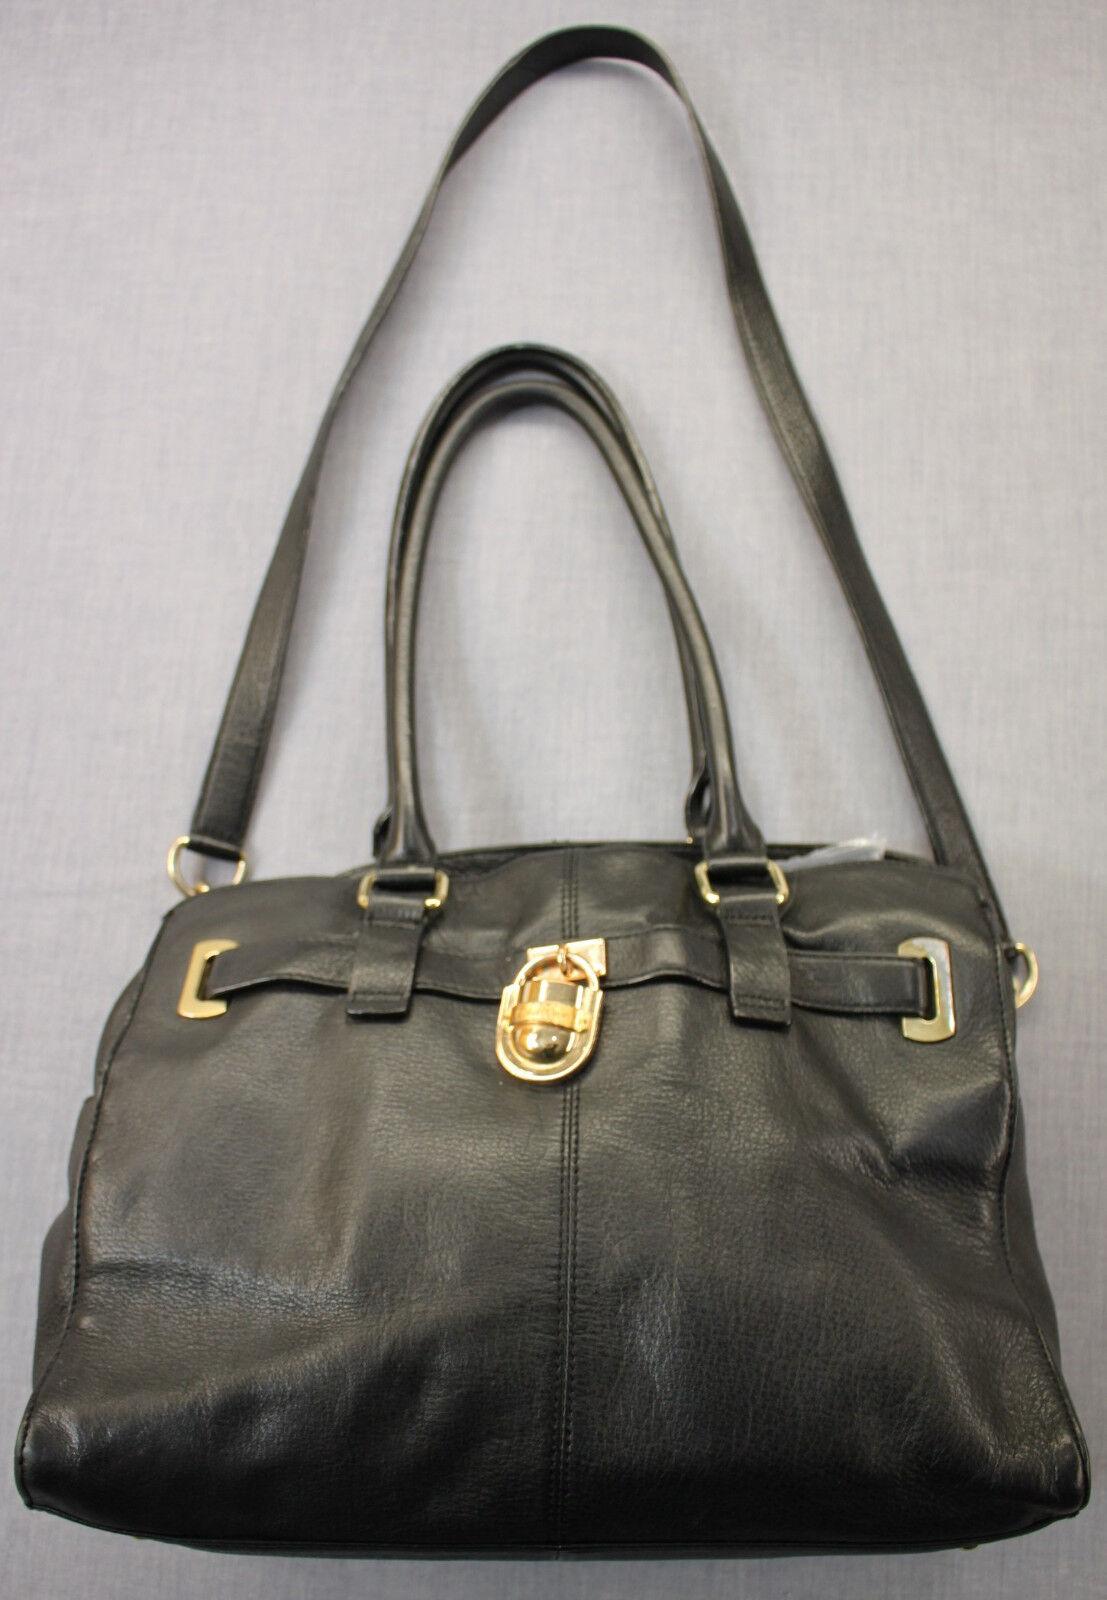 2cc055fb0c Calvin Klein Modena H2gaa800 Tote Handbag Purse Leather White for ...